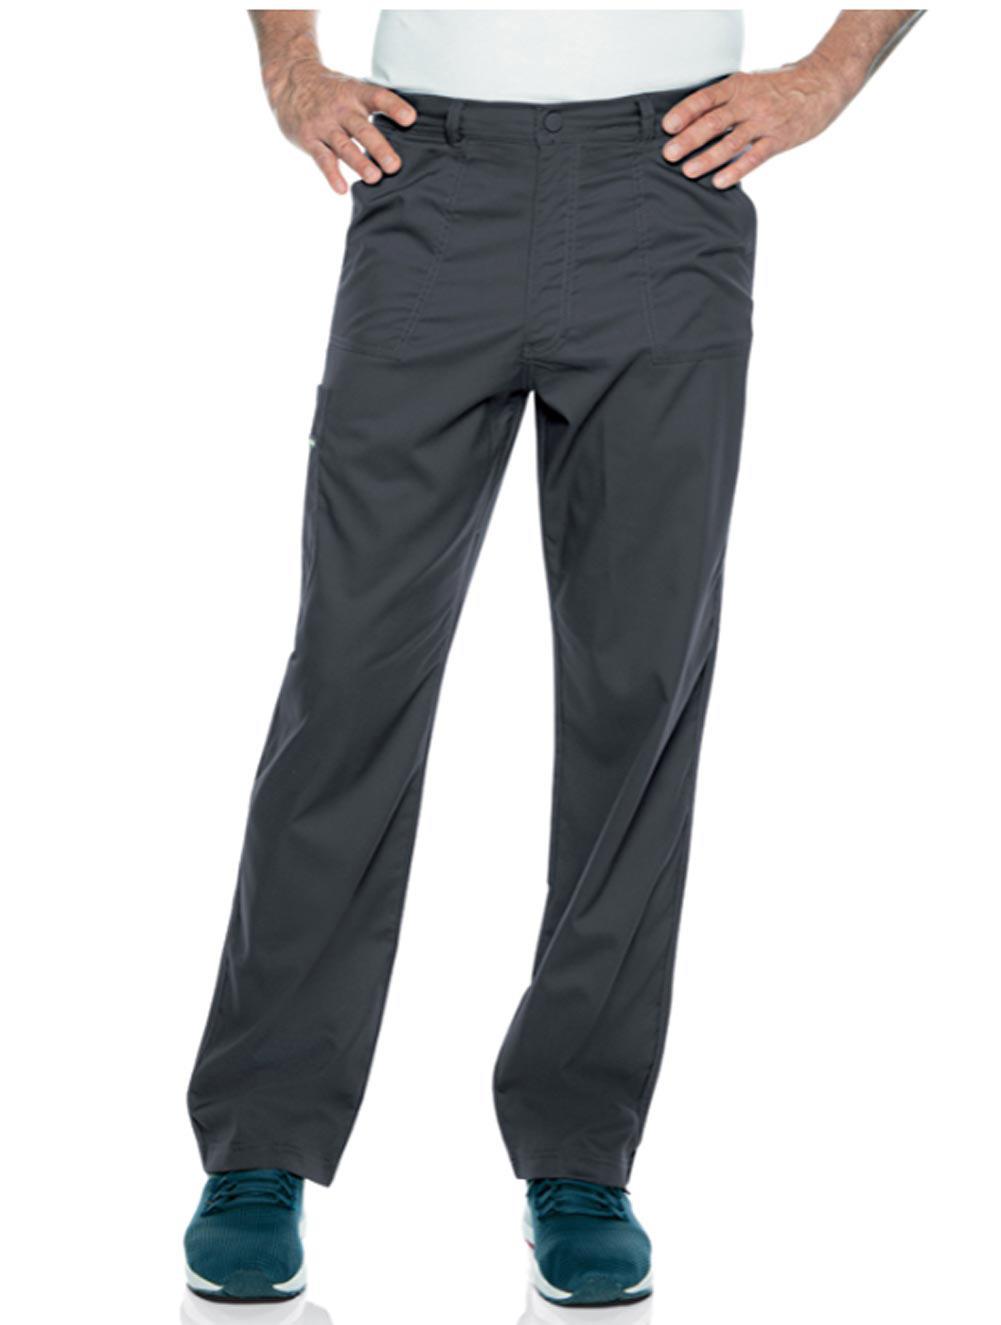 Men's Drawstring Front Elastic Back Cargo Pant